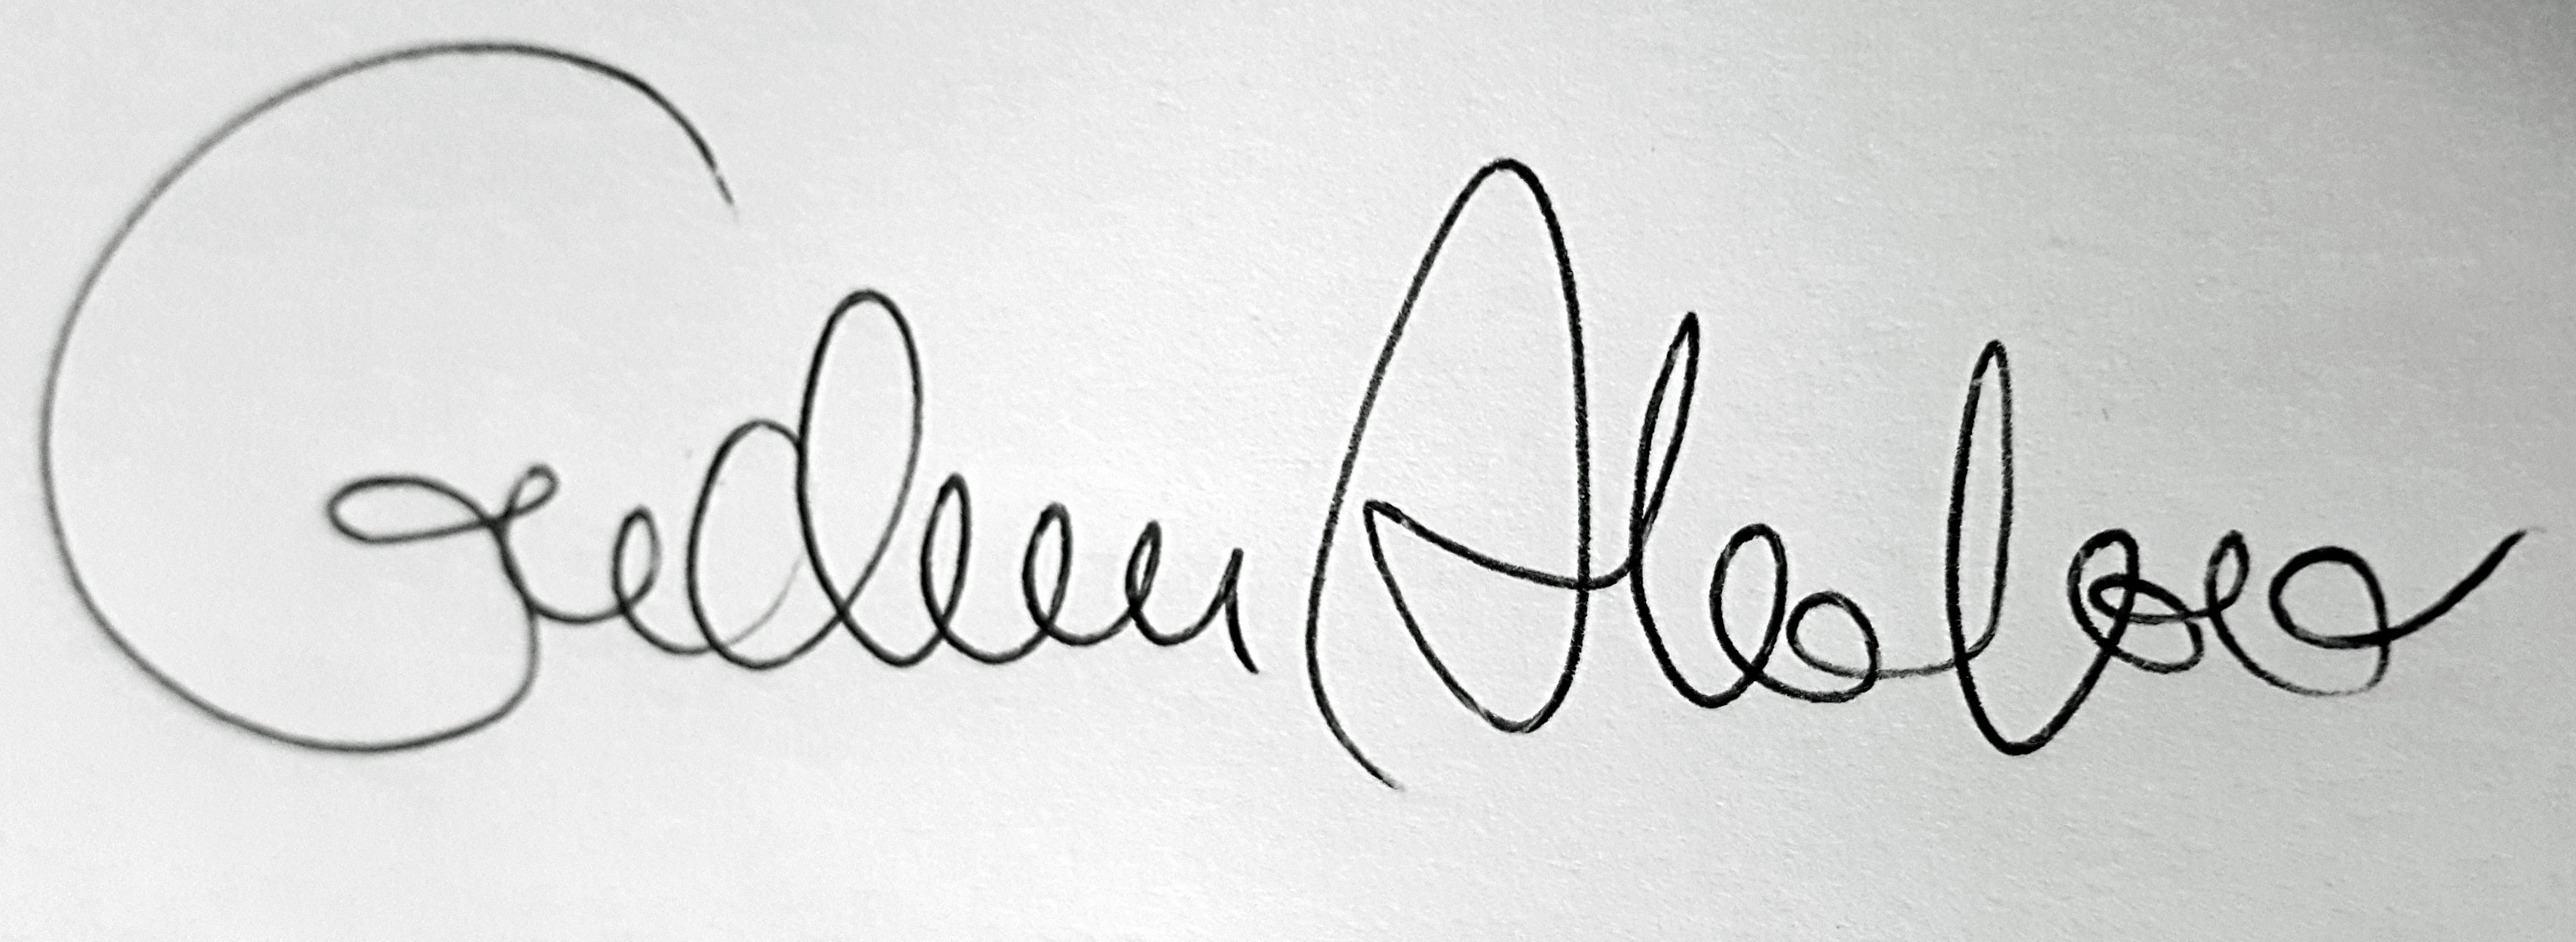 Gudrun Alvebro Signature